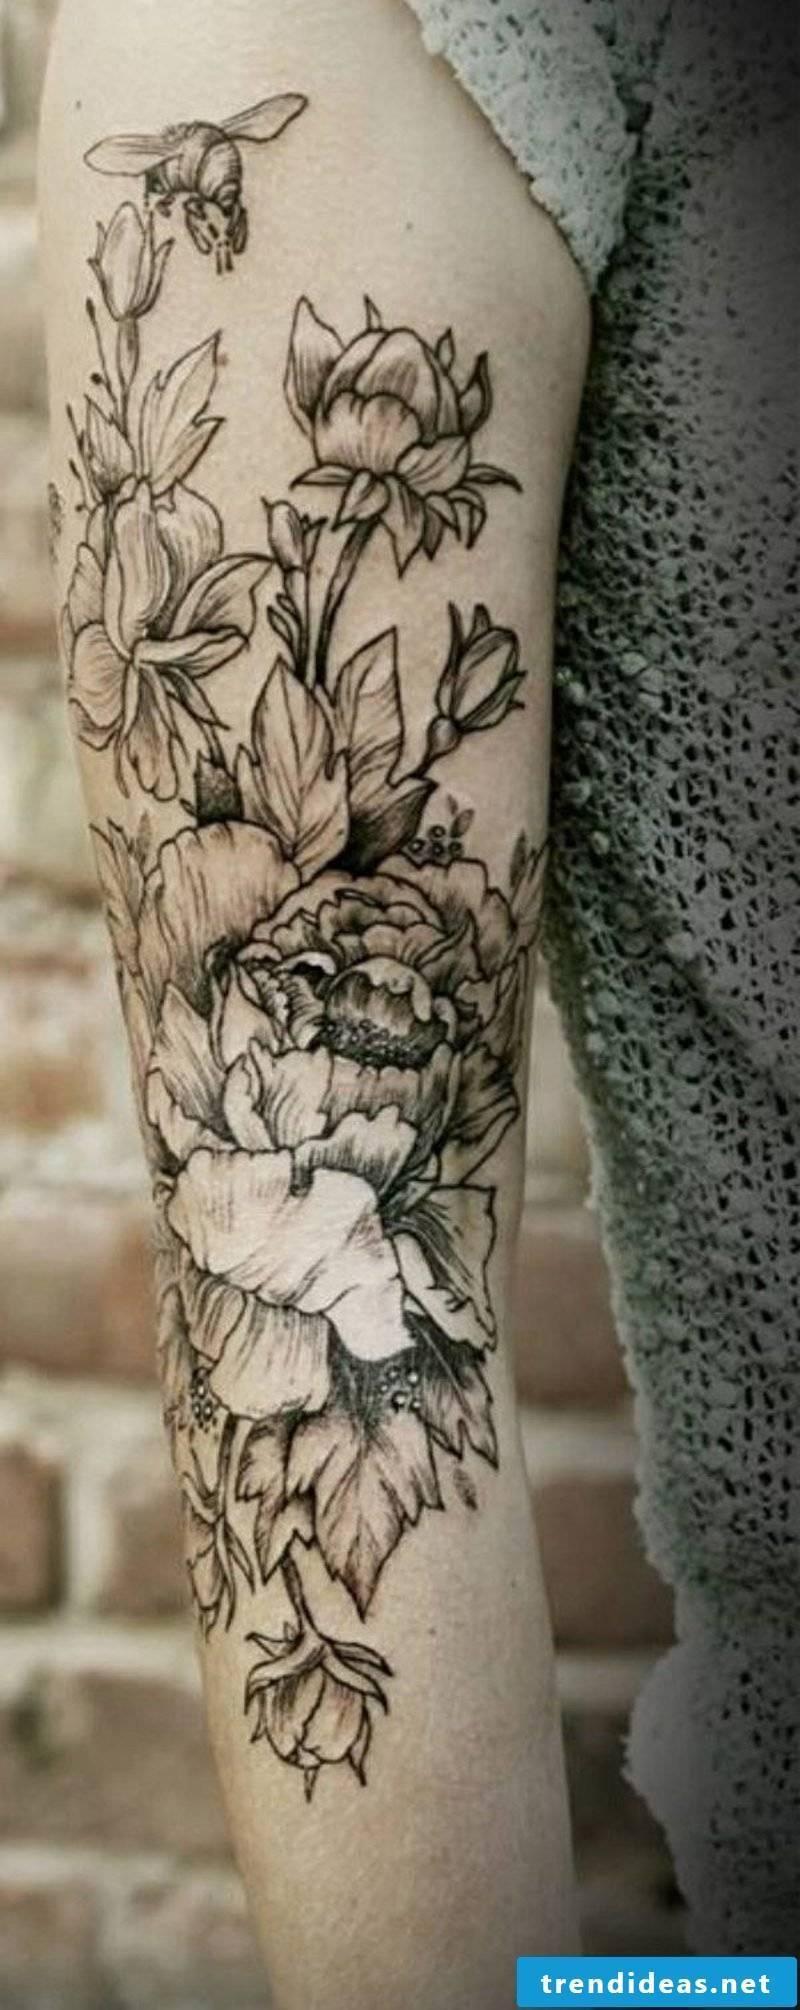 Very realistic tattoo